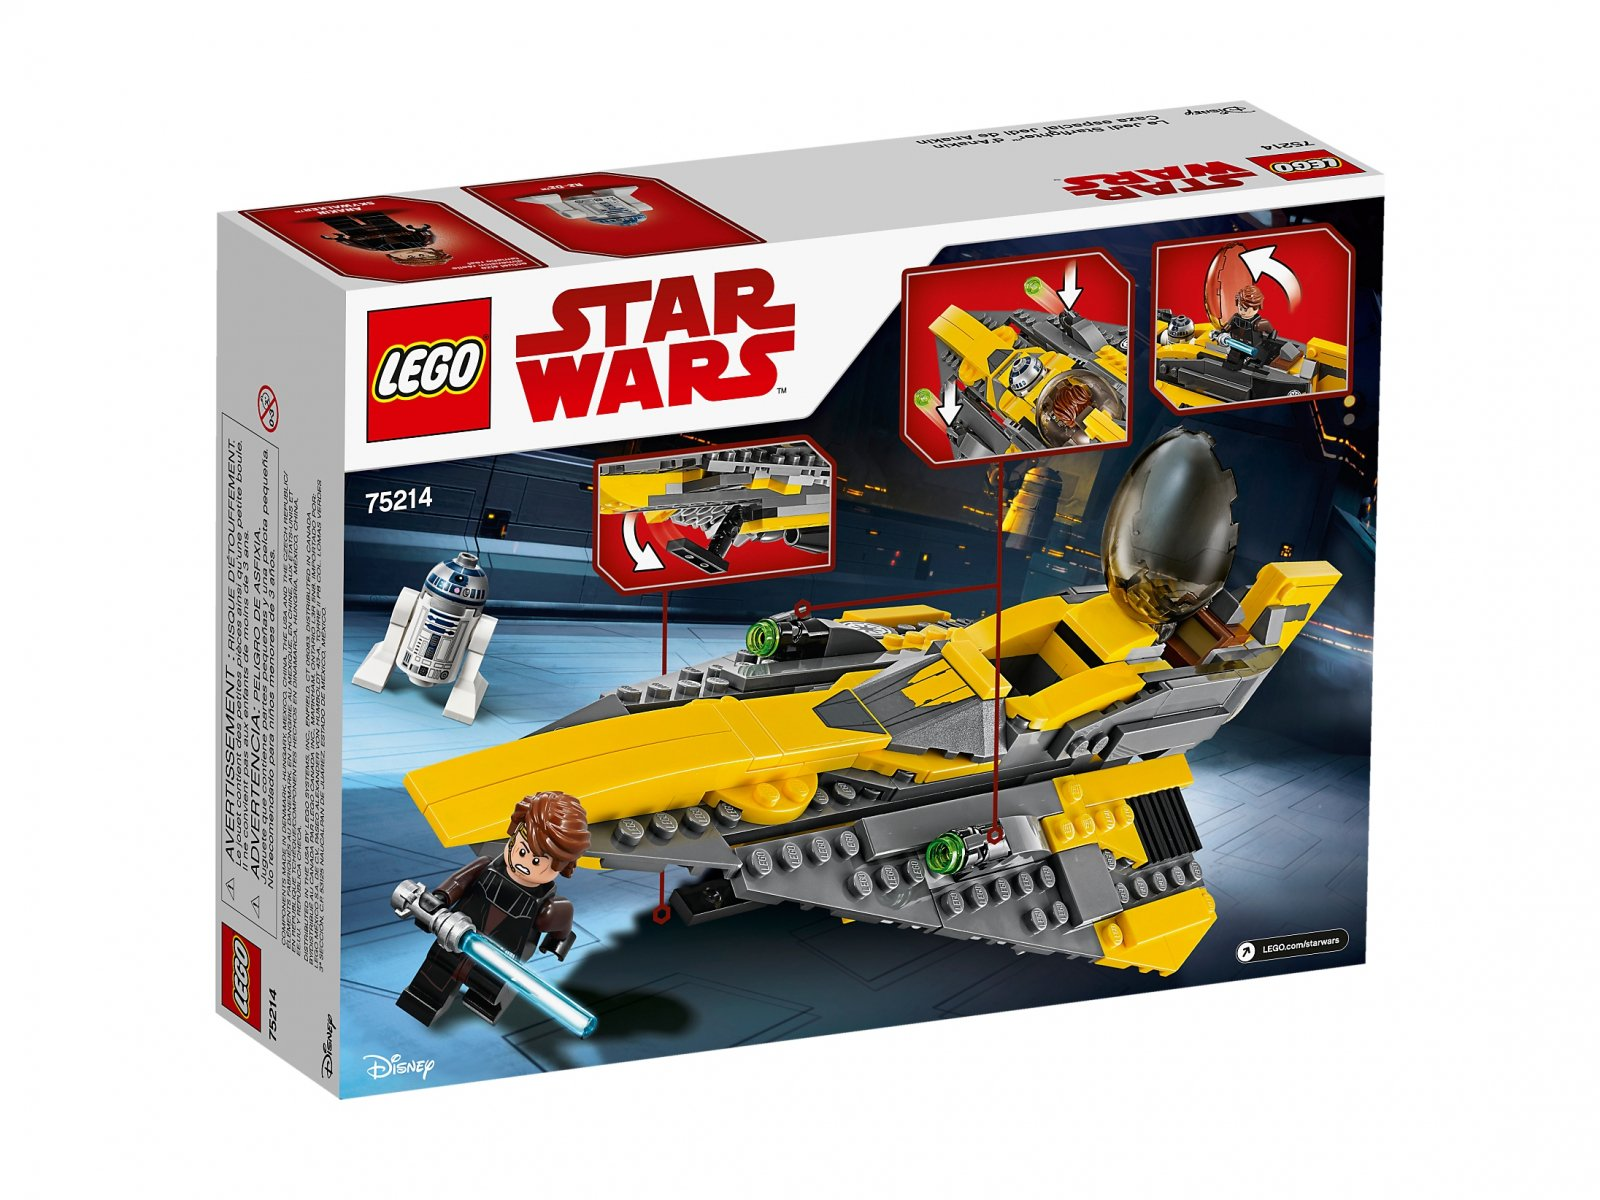 LEGO Star Wars™ 75214 Jedi Starfighter Anakina™